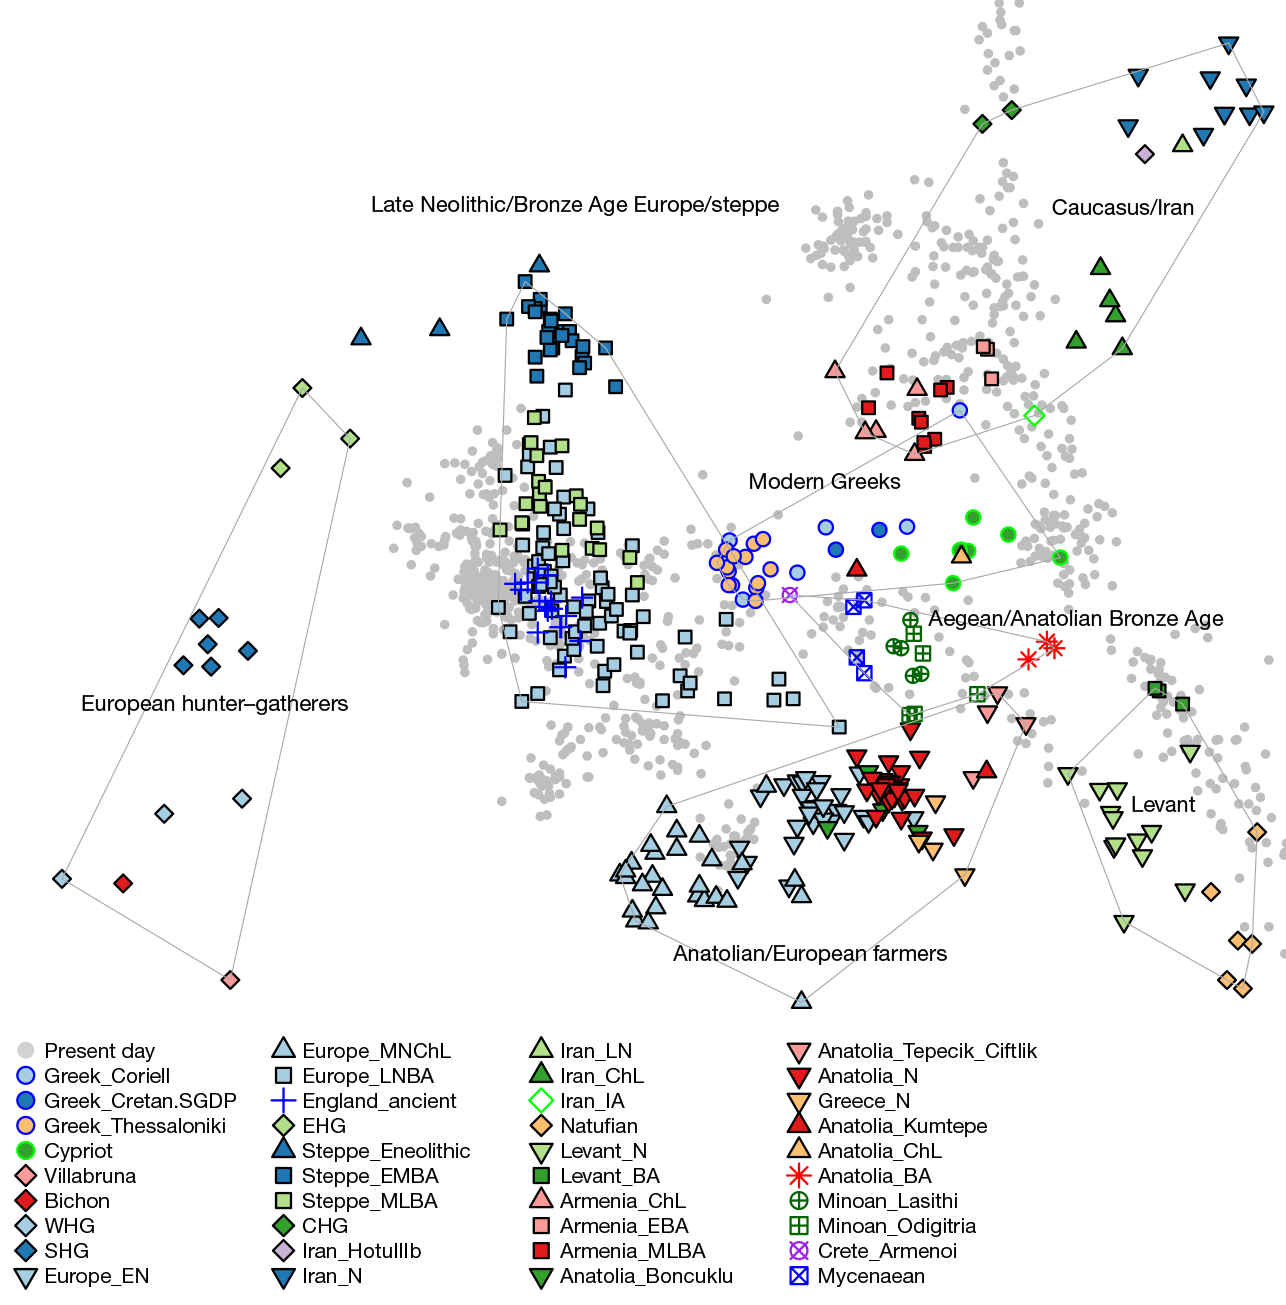 lazaridis-pca-minoans-mycenaeans-anatolians